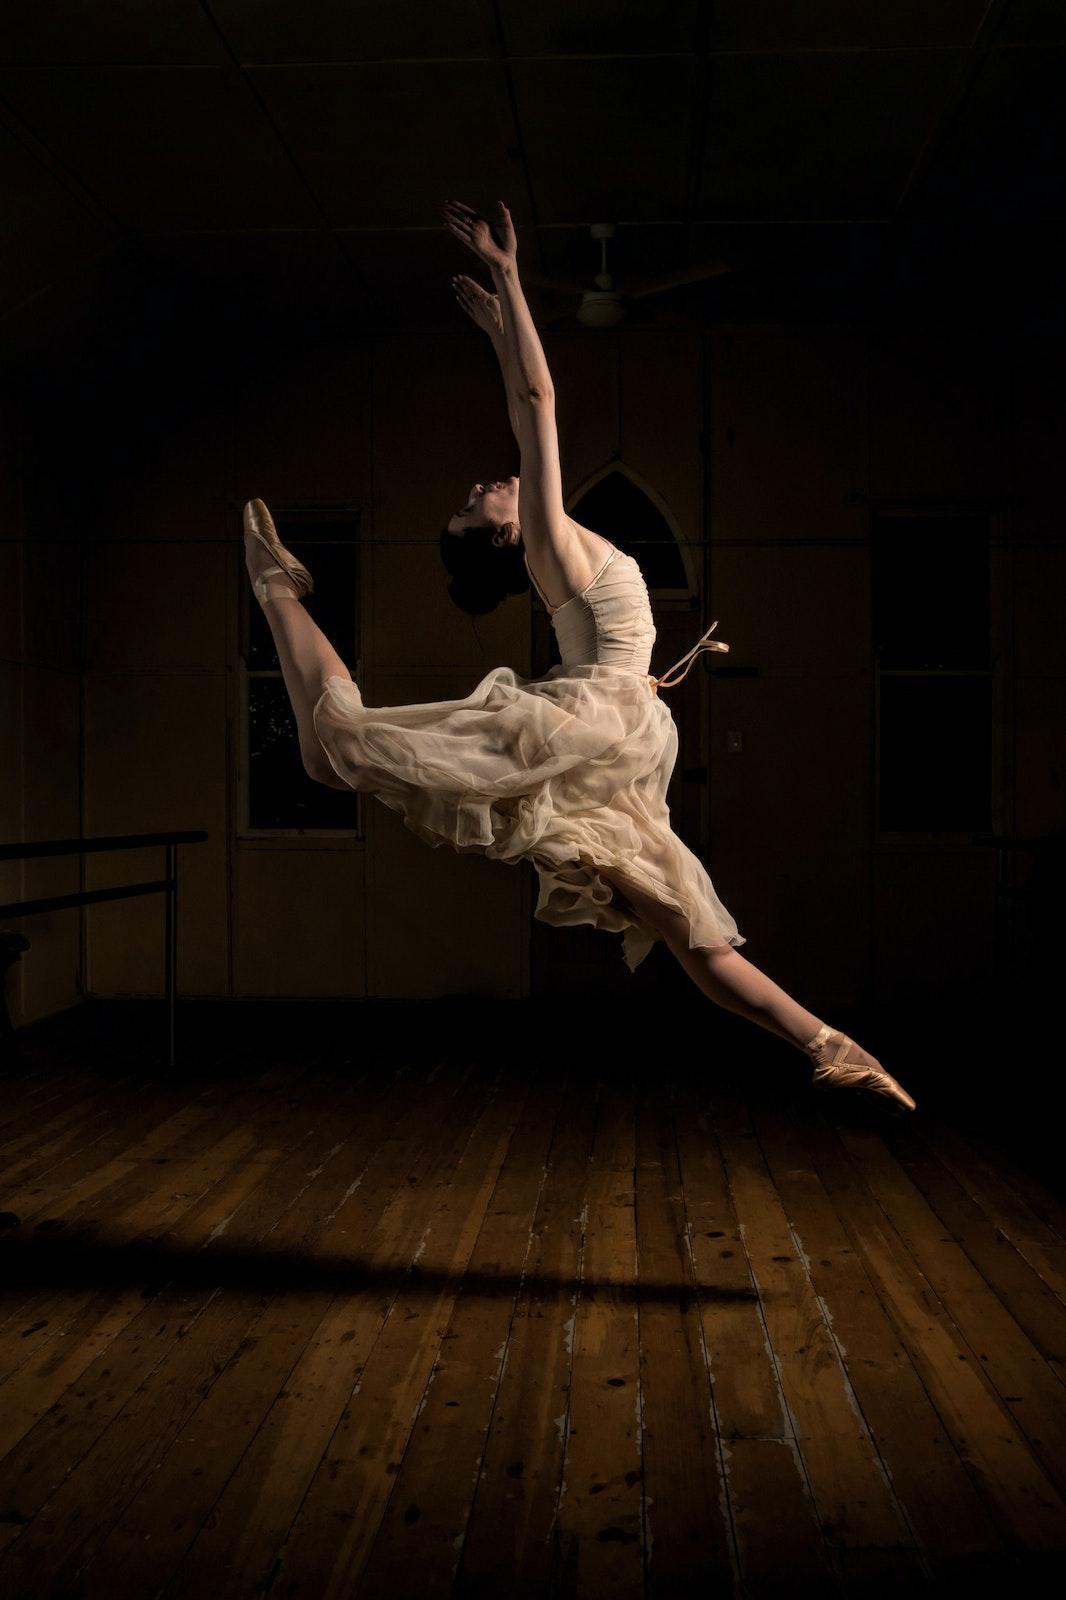 Storm Lahiff_Maddie ballerina